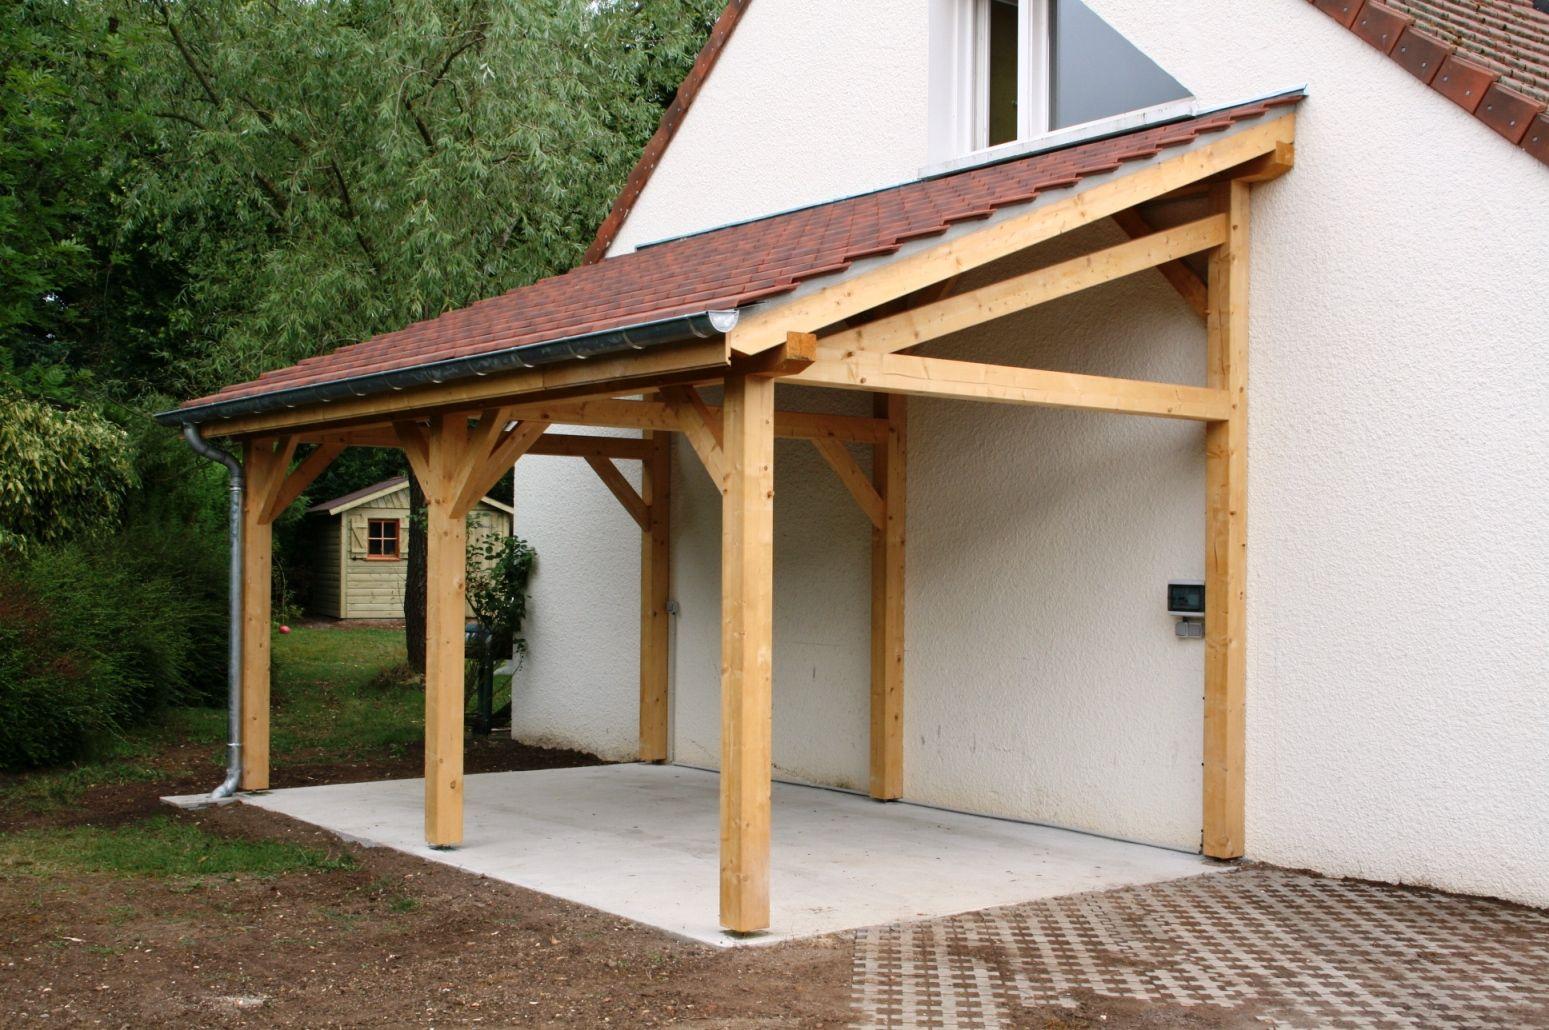 Garage 1 Pente 2.70Mx7.00M - Cerisier : Abris De Jardin En ... dedans Abri De Terrasse En Bois